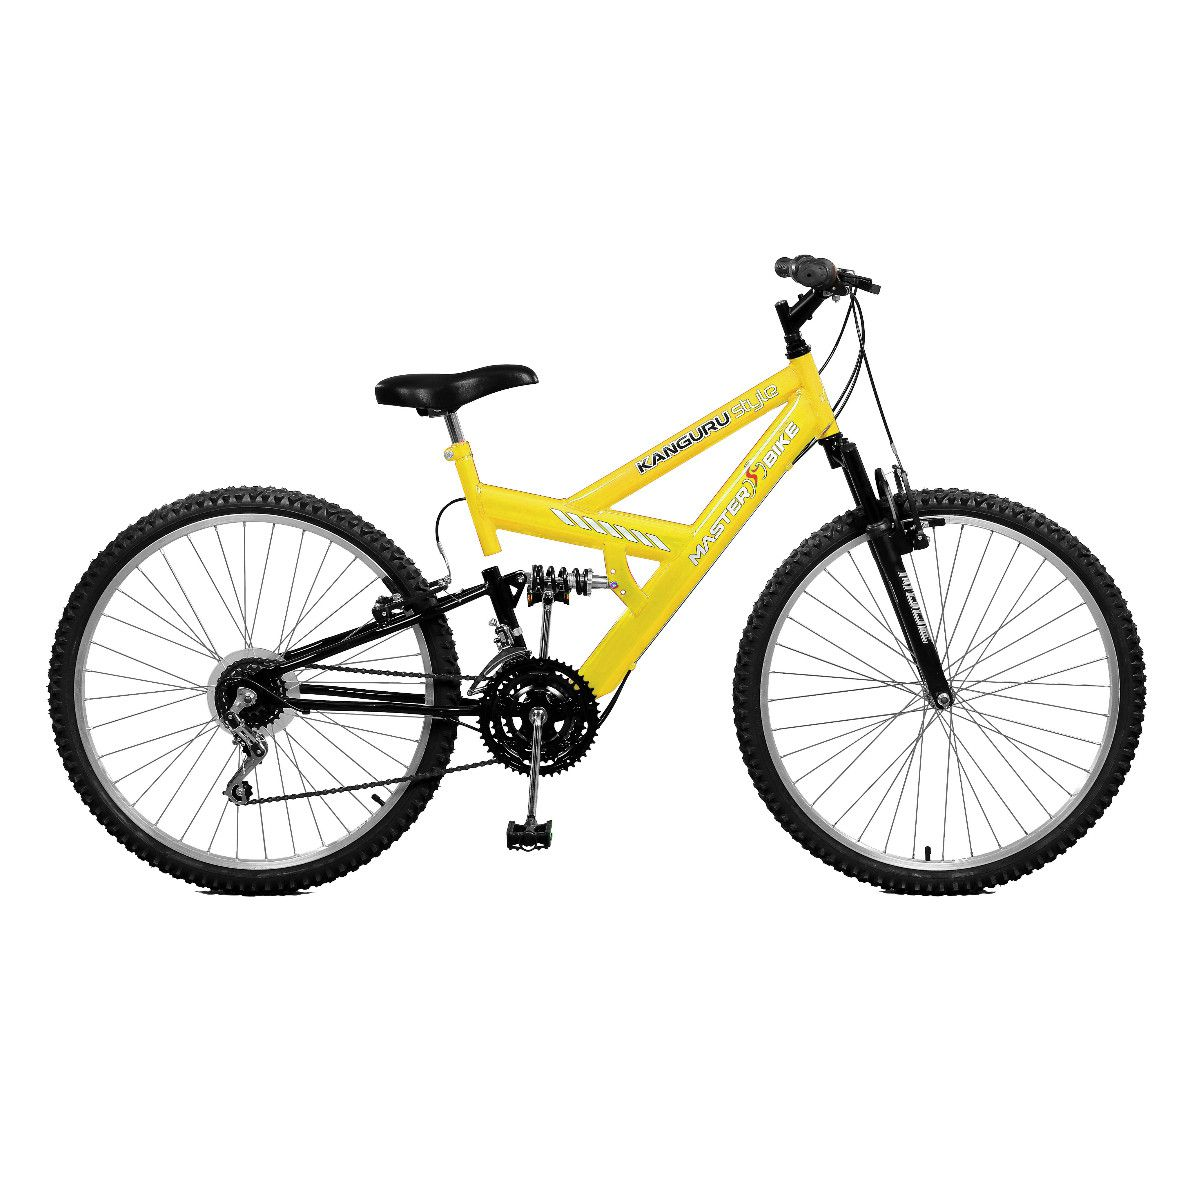 Bicicleta Master Bike Aro 26 Kanguru Style 21 Marchas V-Brake Amarelo/Preto